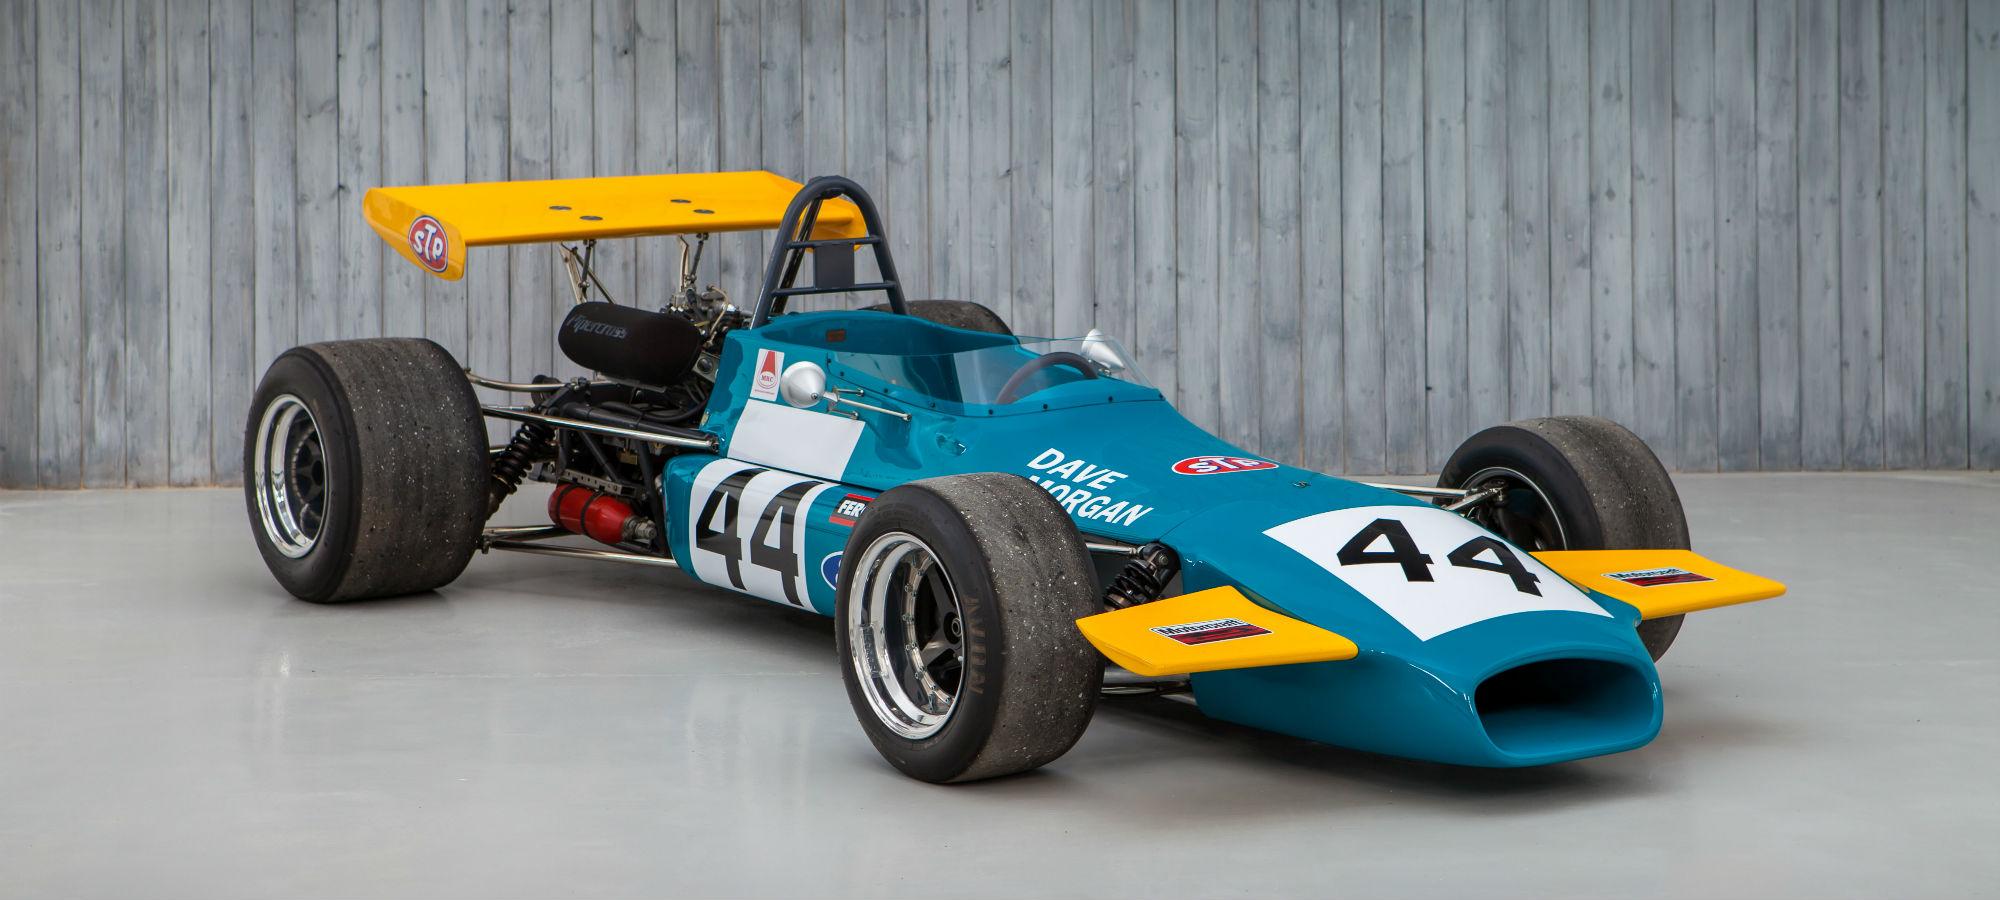 The Ex – Dave Morgan, 1972 European and British Formula 2 Race Winning 1971 Brabham BT35